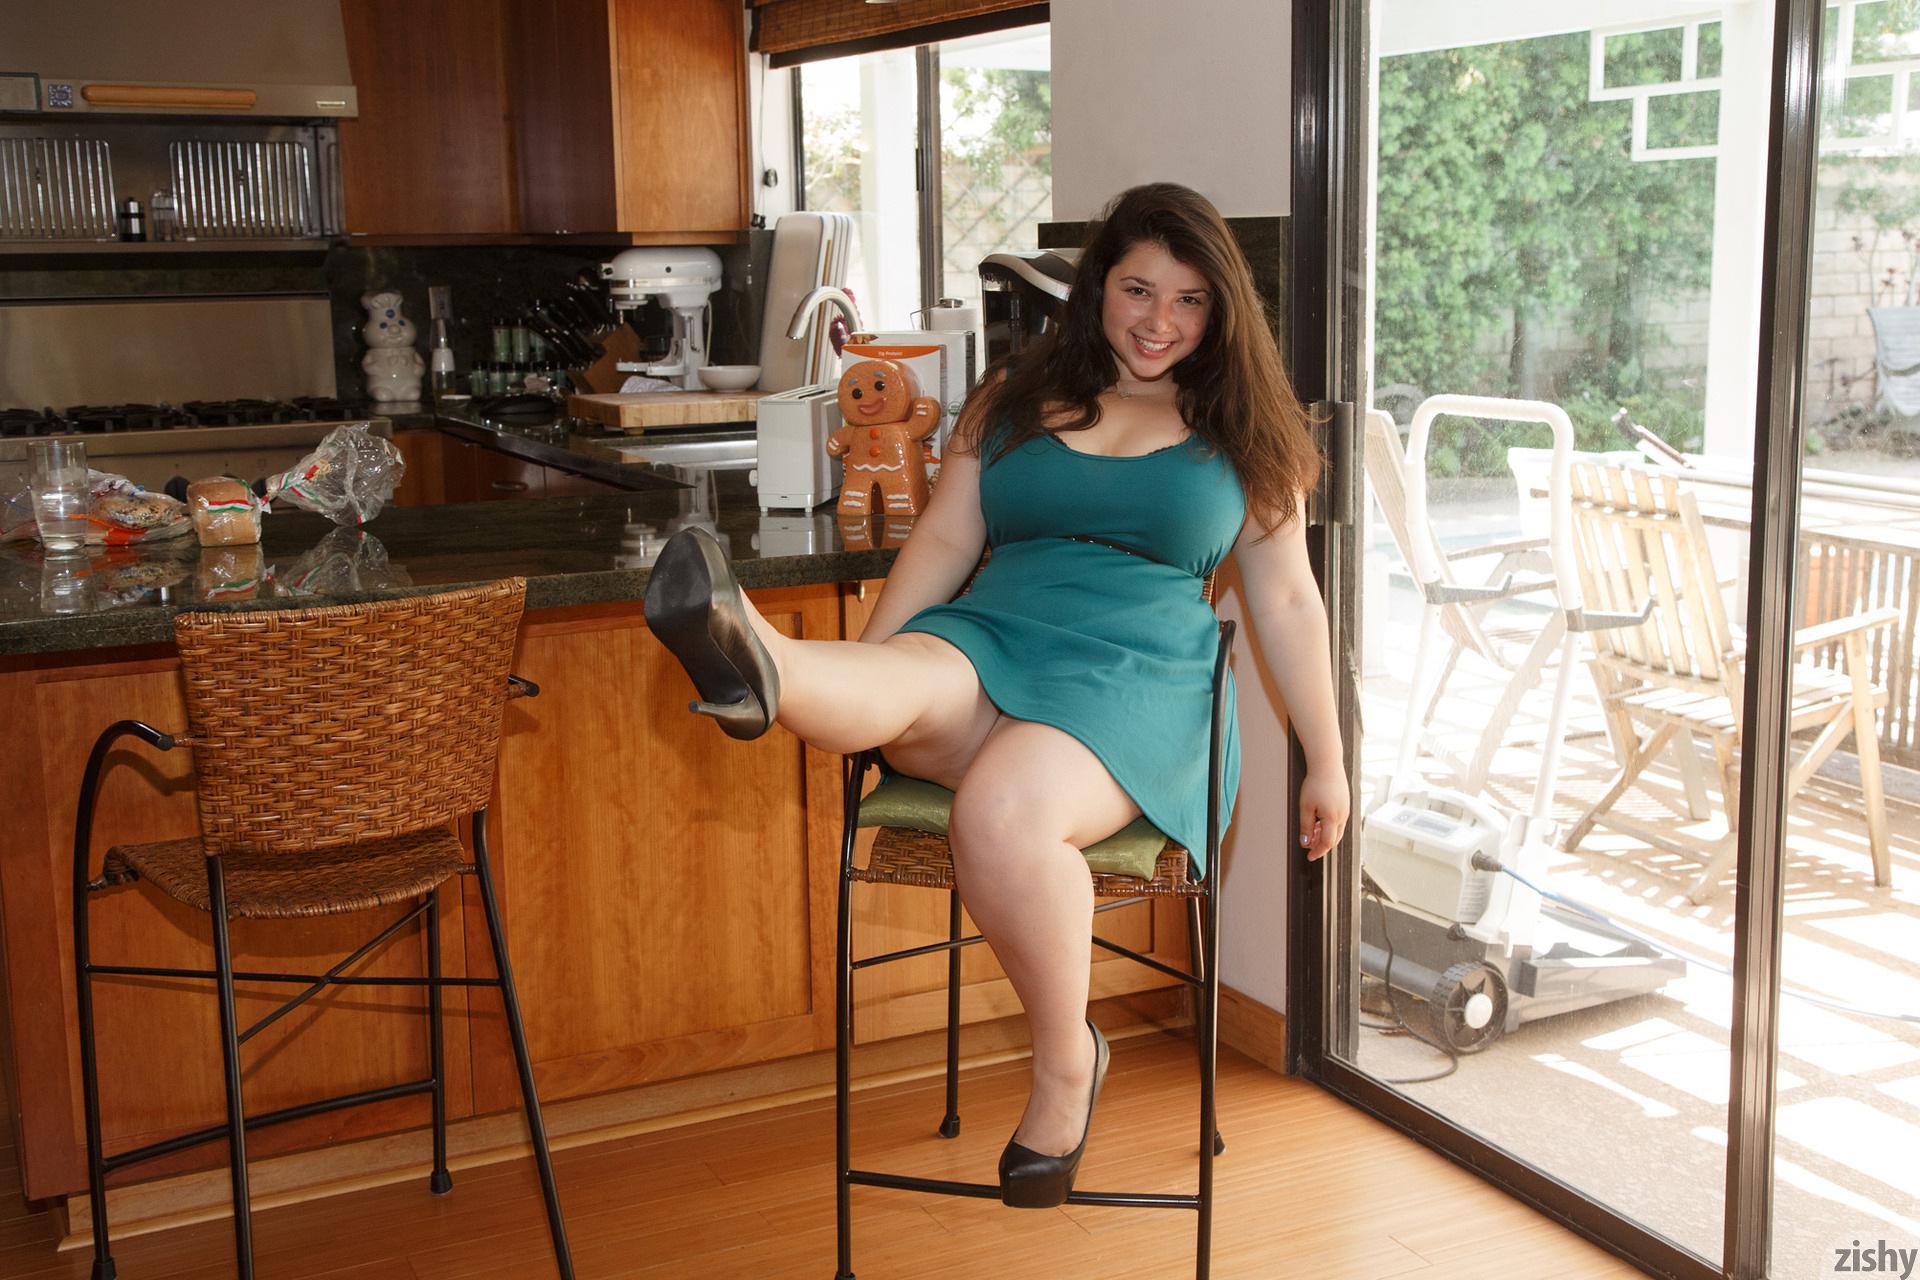 Carolina Munoz Hearts A Full Zishy (24)